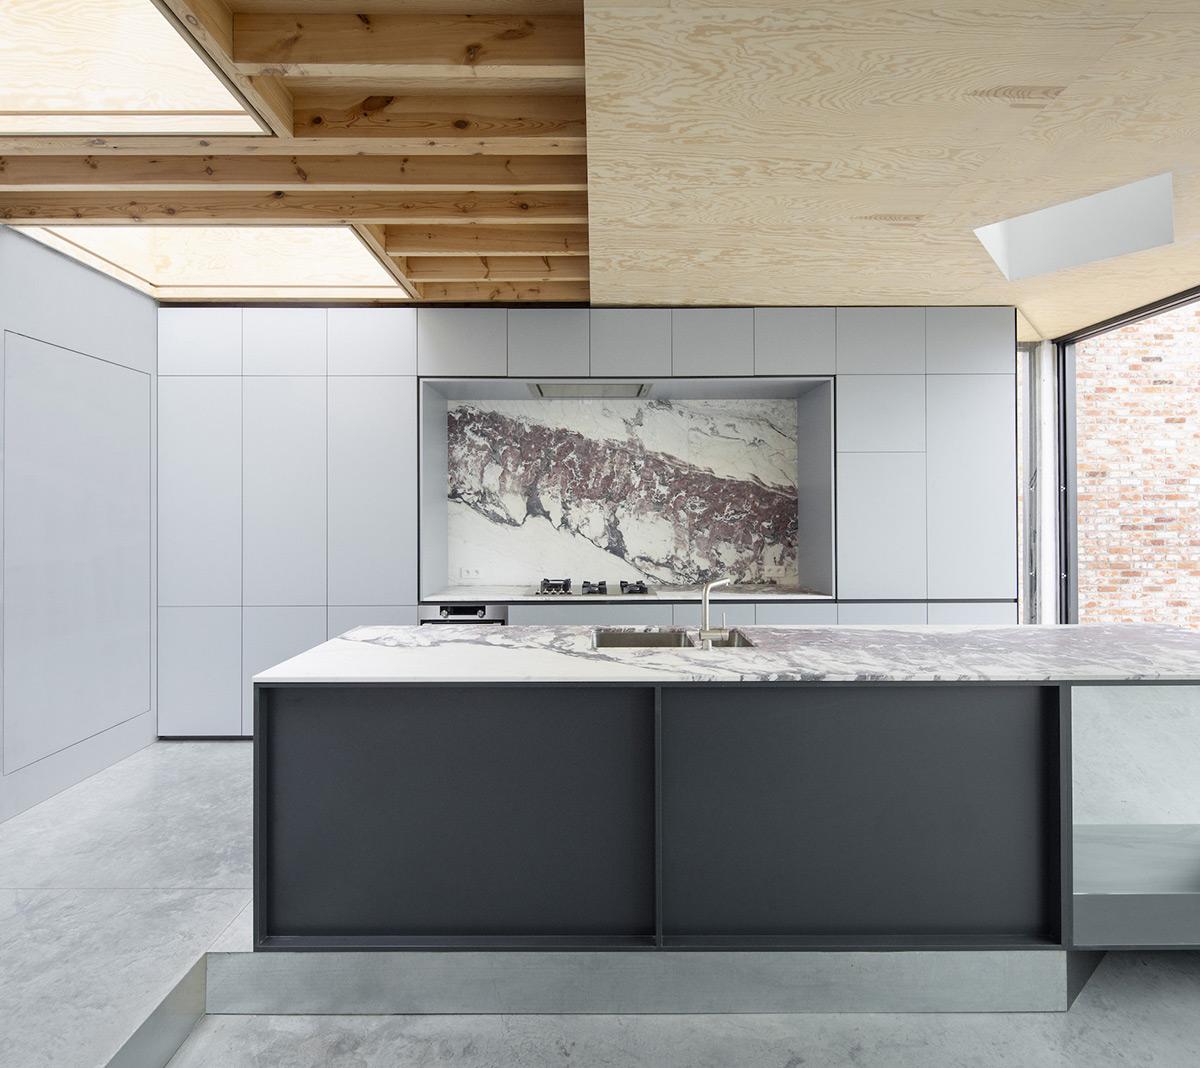 MIKA-ism-architecten-Luis-Diaz-Diaz-01